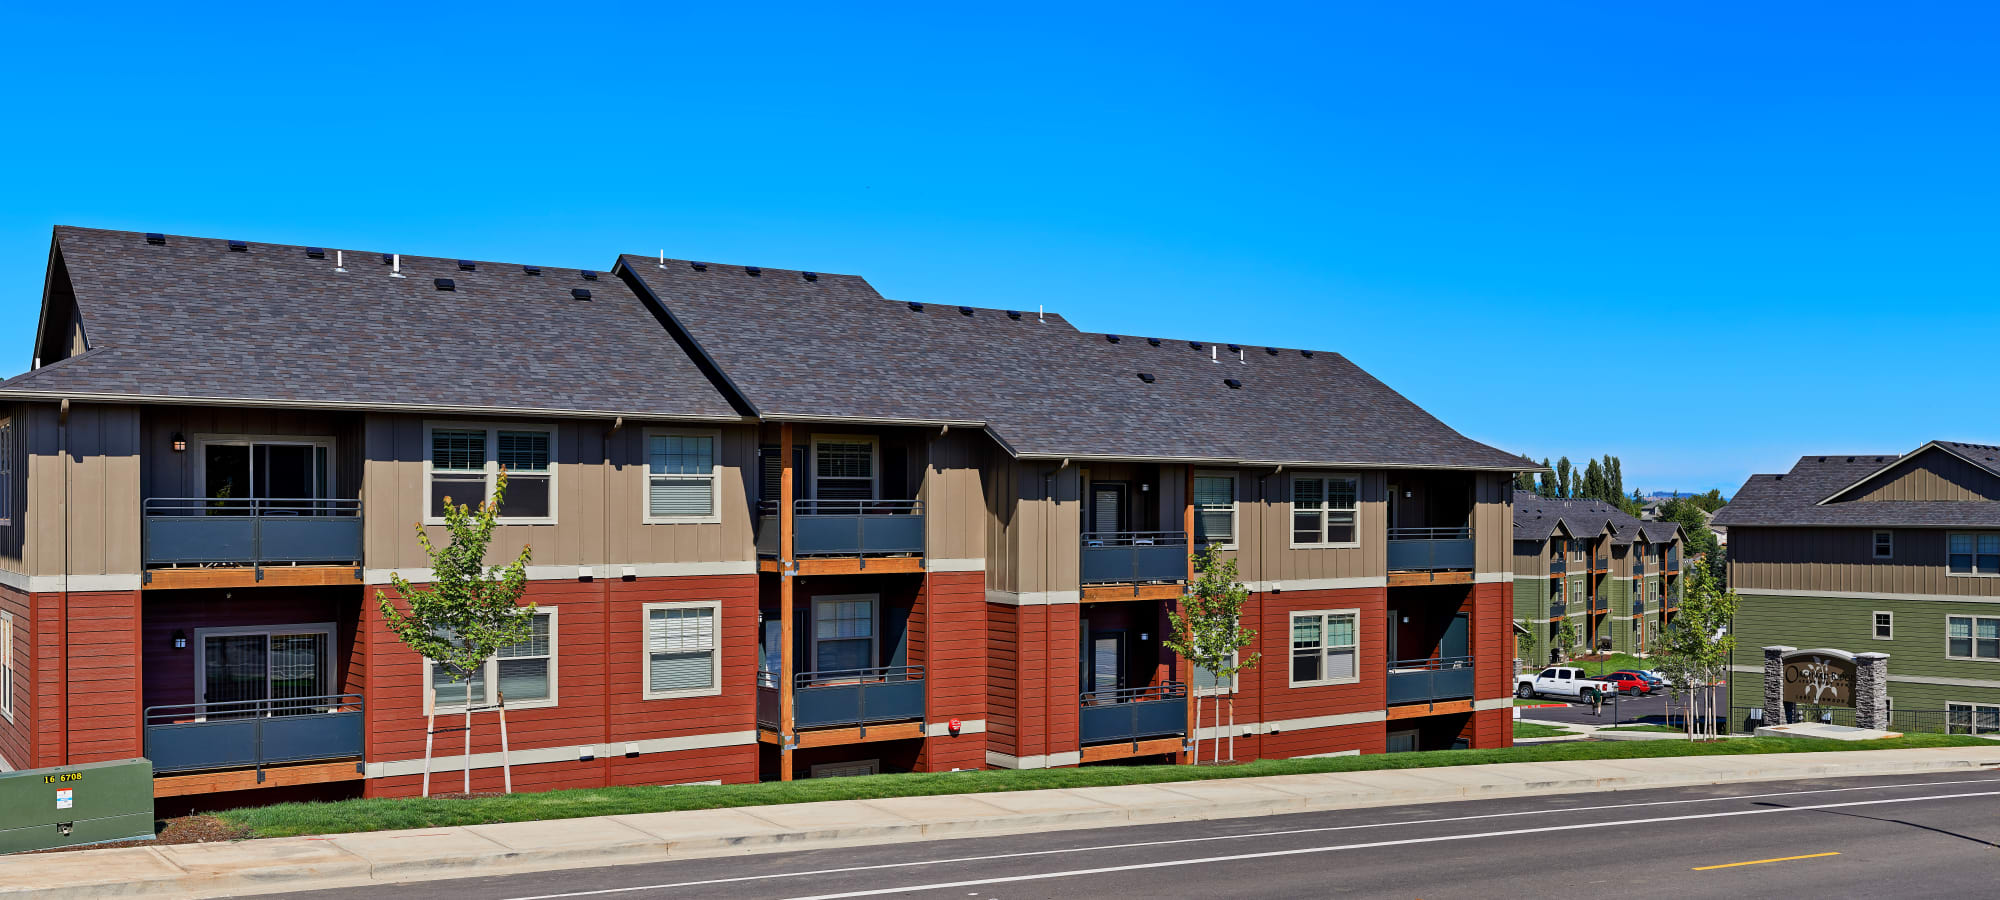 Apartments at Orchard Ridge in Salem, Oregon